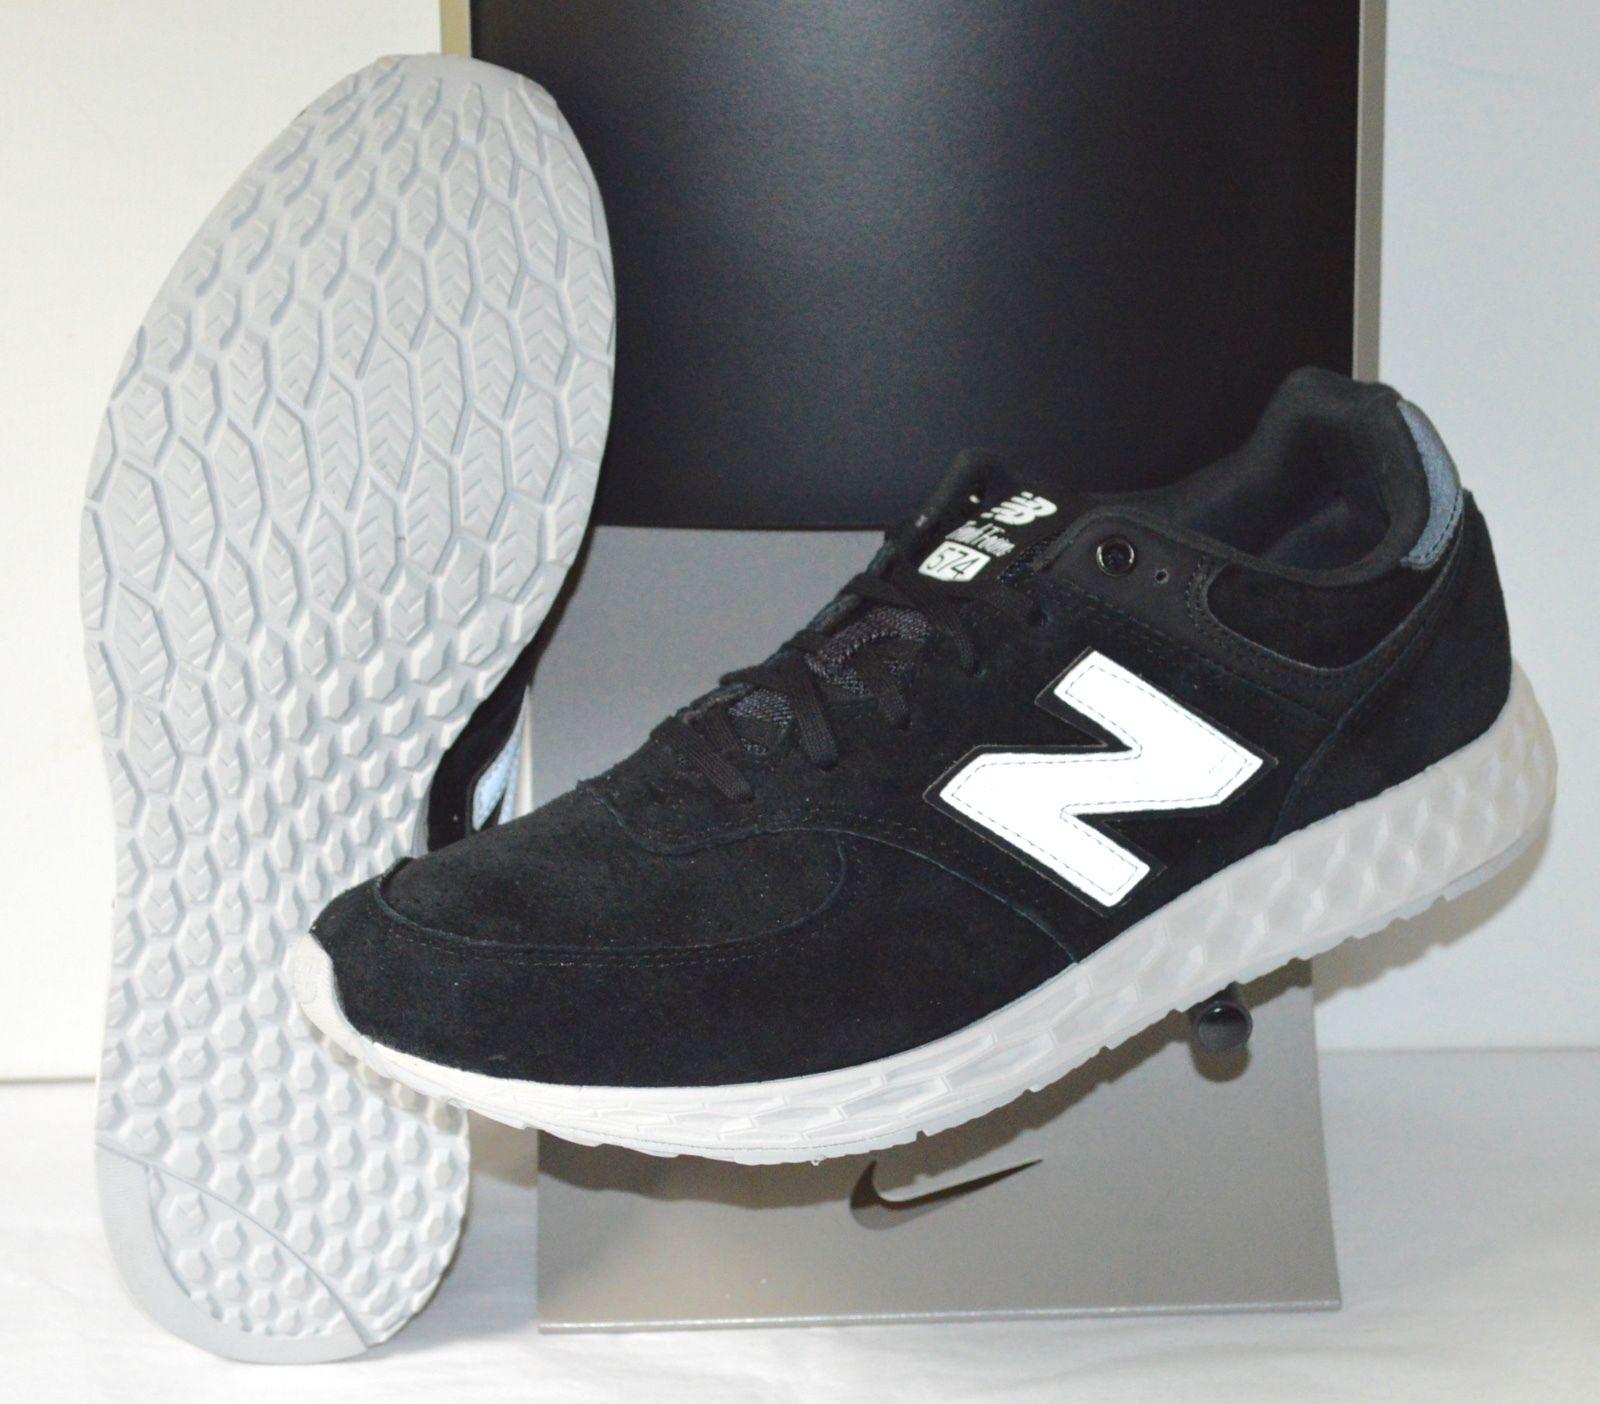 New 120 New Balance NB Fresh Foam 574 Black/White Suede sz 10 Excellent Ride